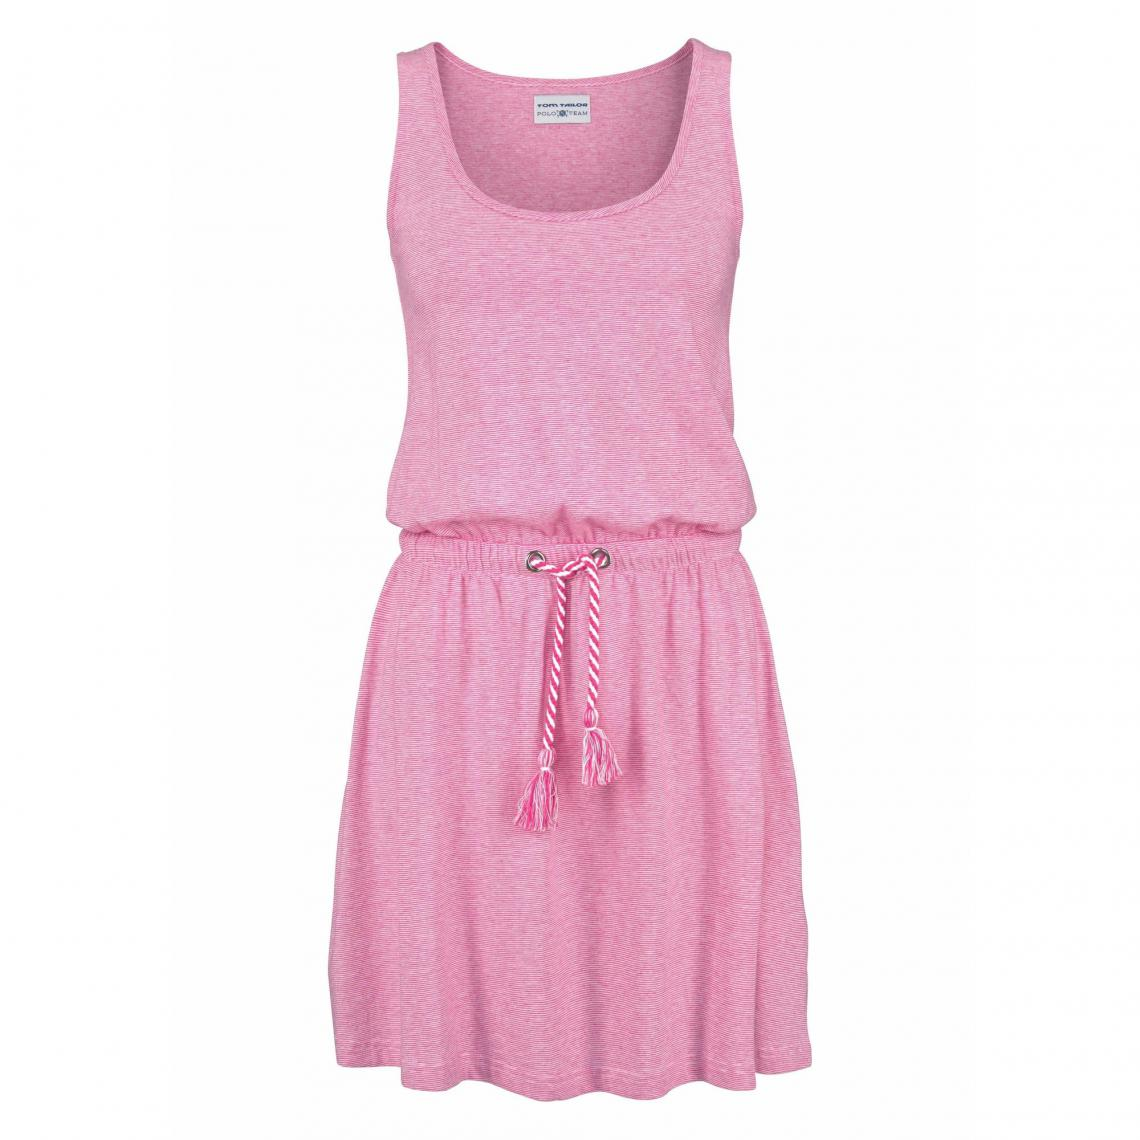 Tailor Longue Manches Rose Robe Sans Col Femme Tom Polo Rond Team UMVpSqzjLG